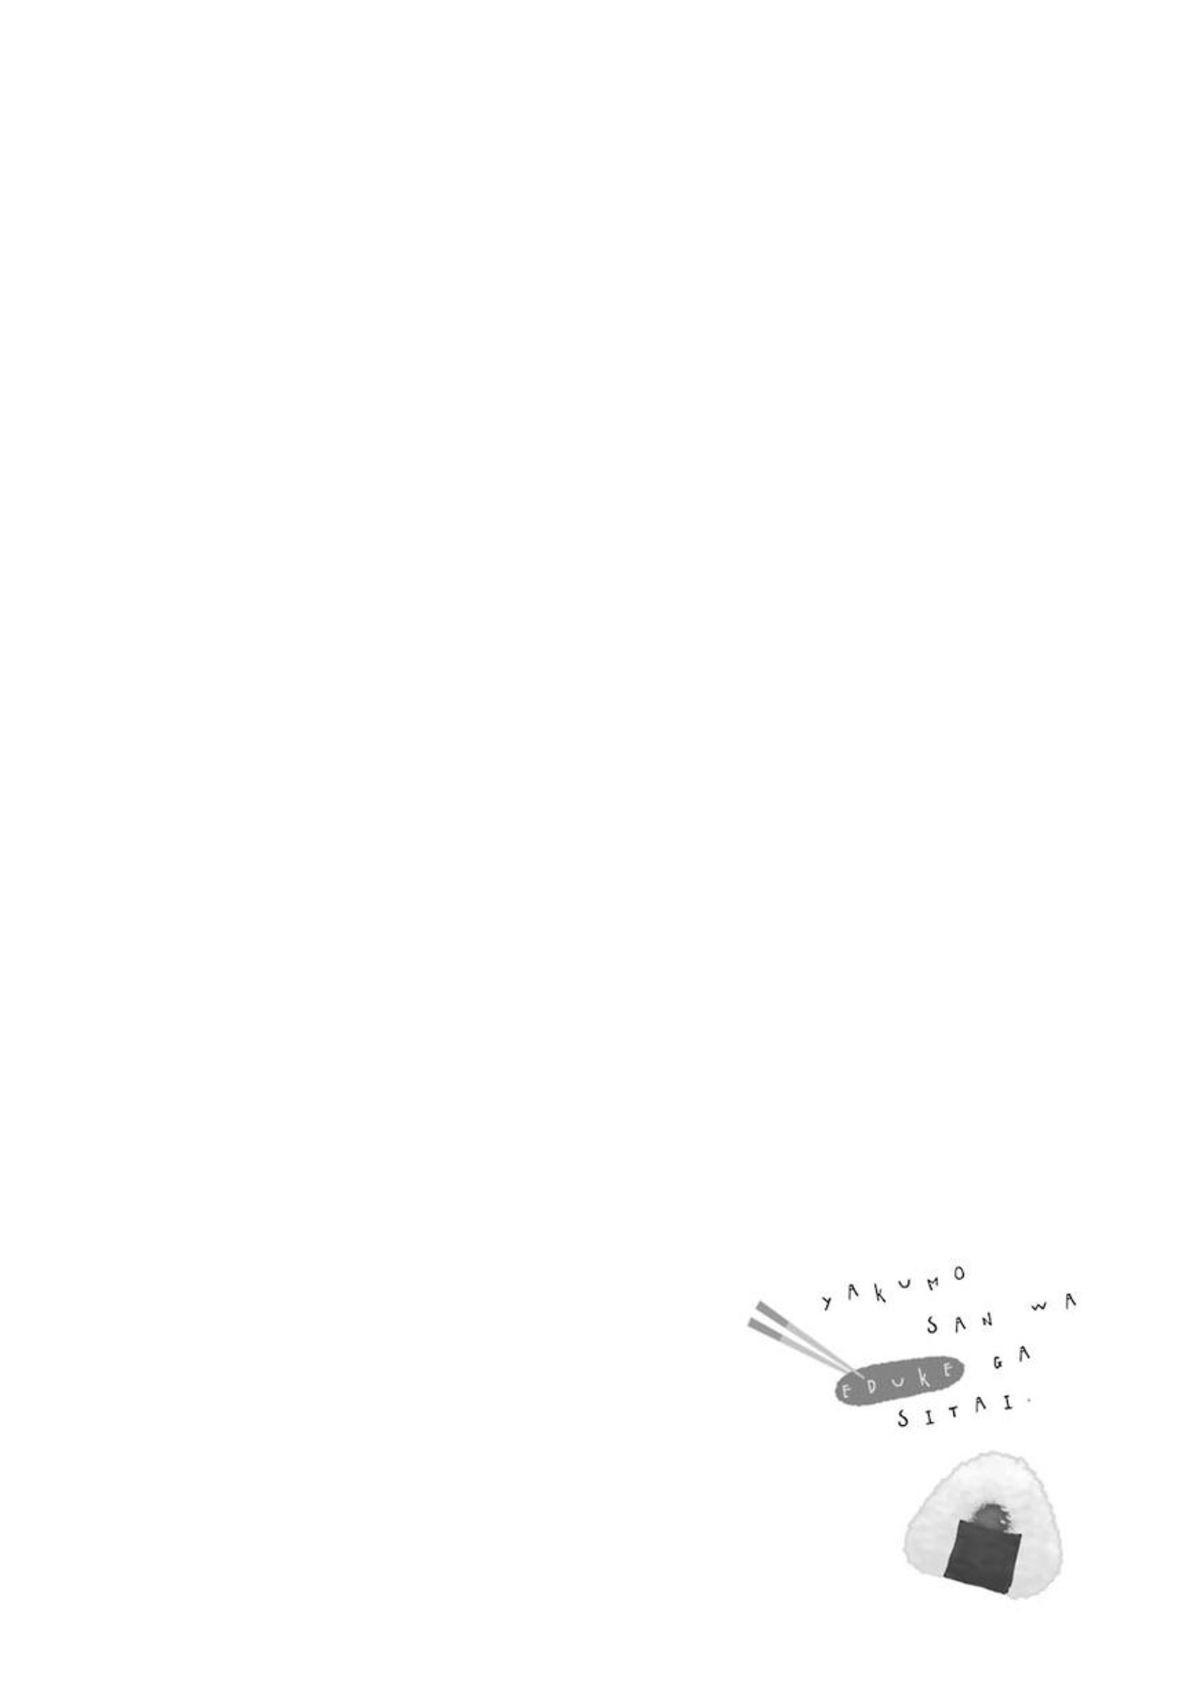 Yakumo-san wa Edzuke ga Shitai Chp 14. join list: WholesomeFoodManga (40 subs)Mention History. wholesome Food manga